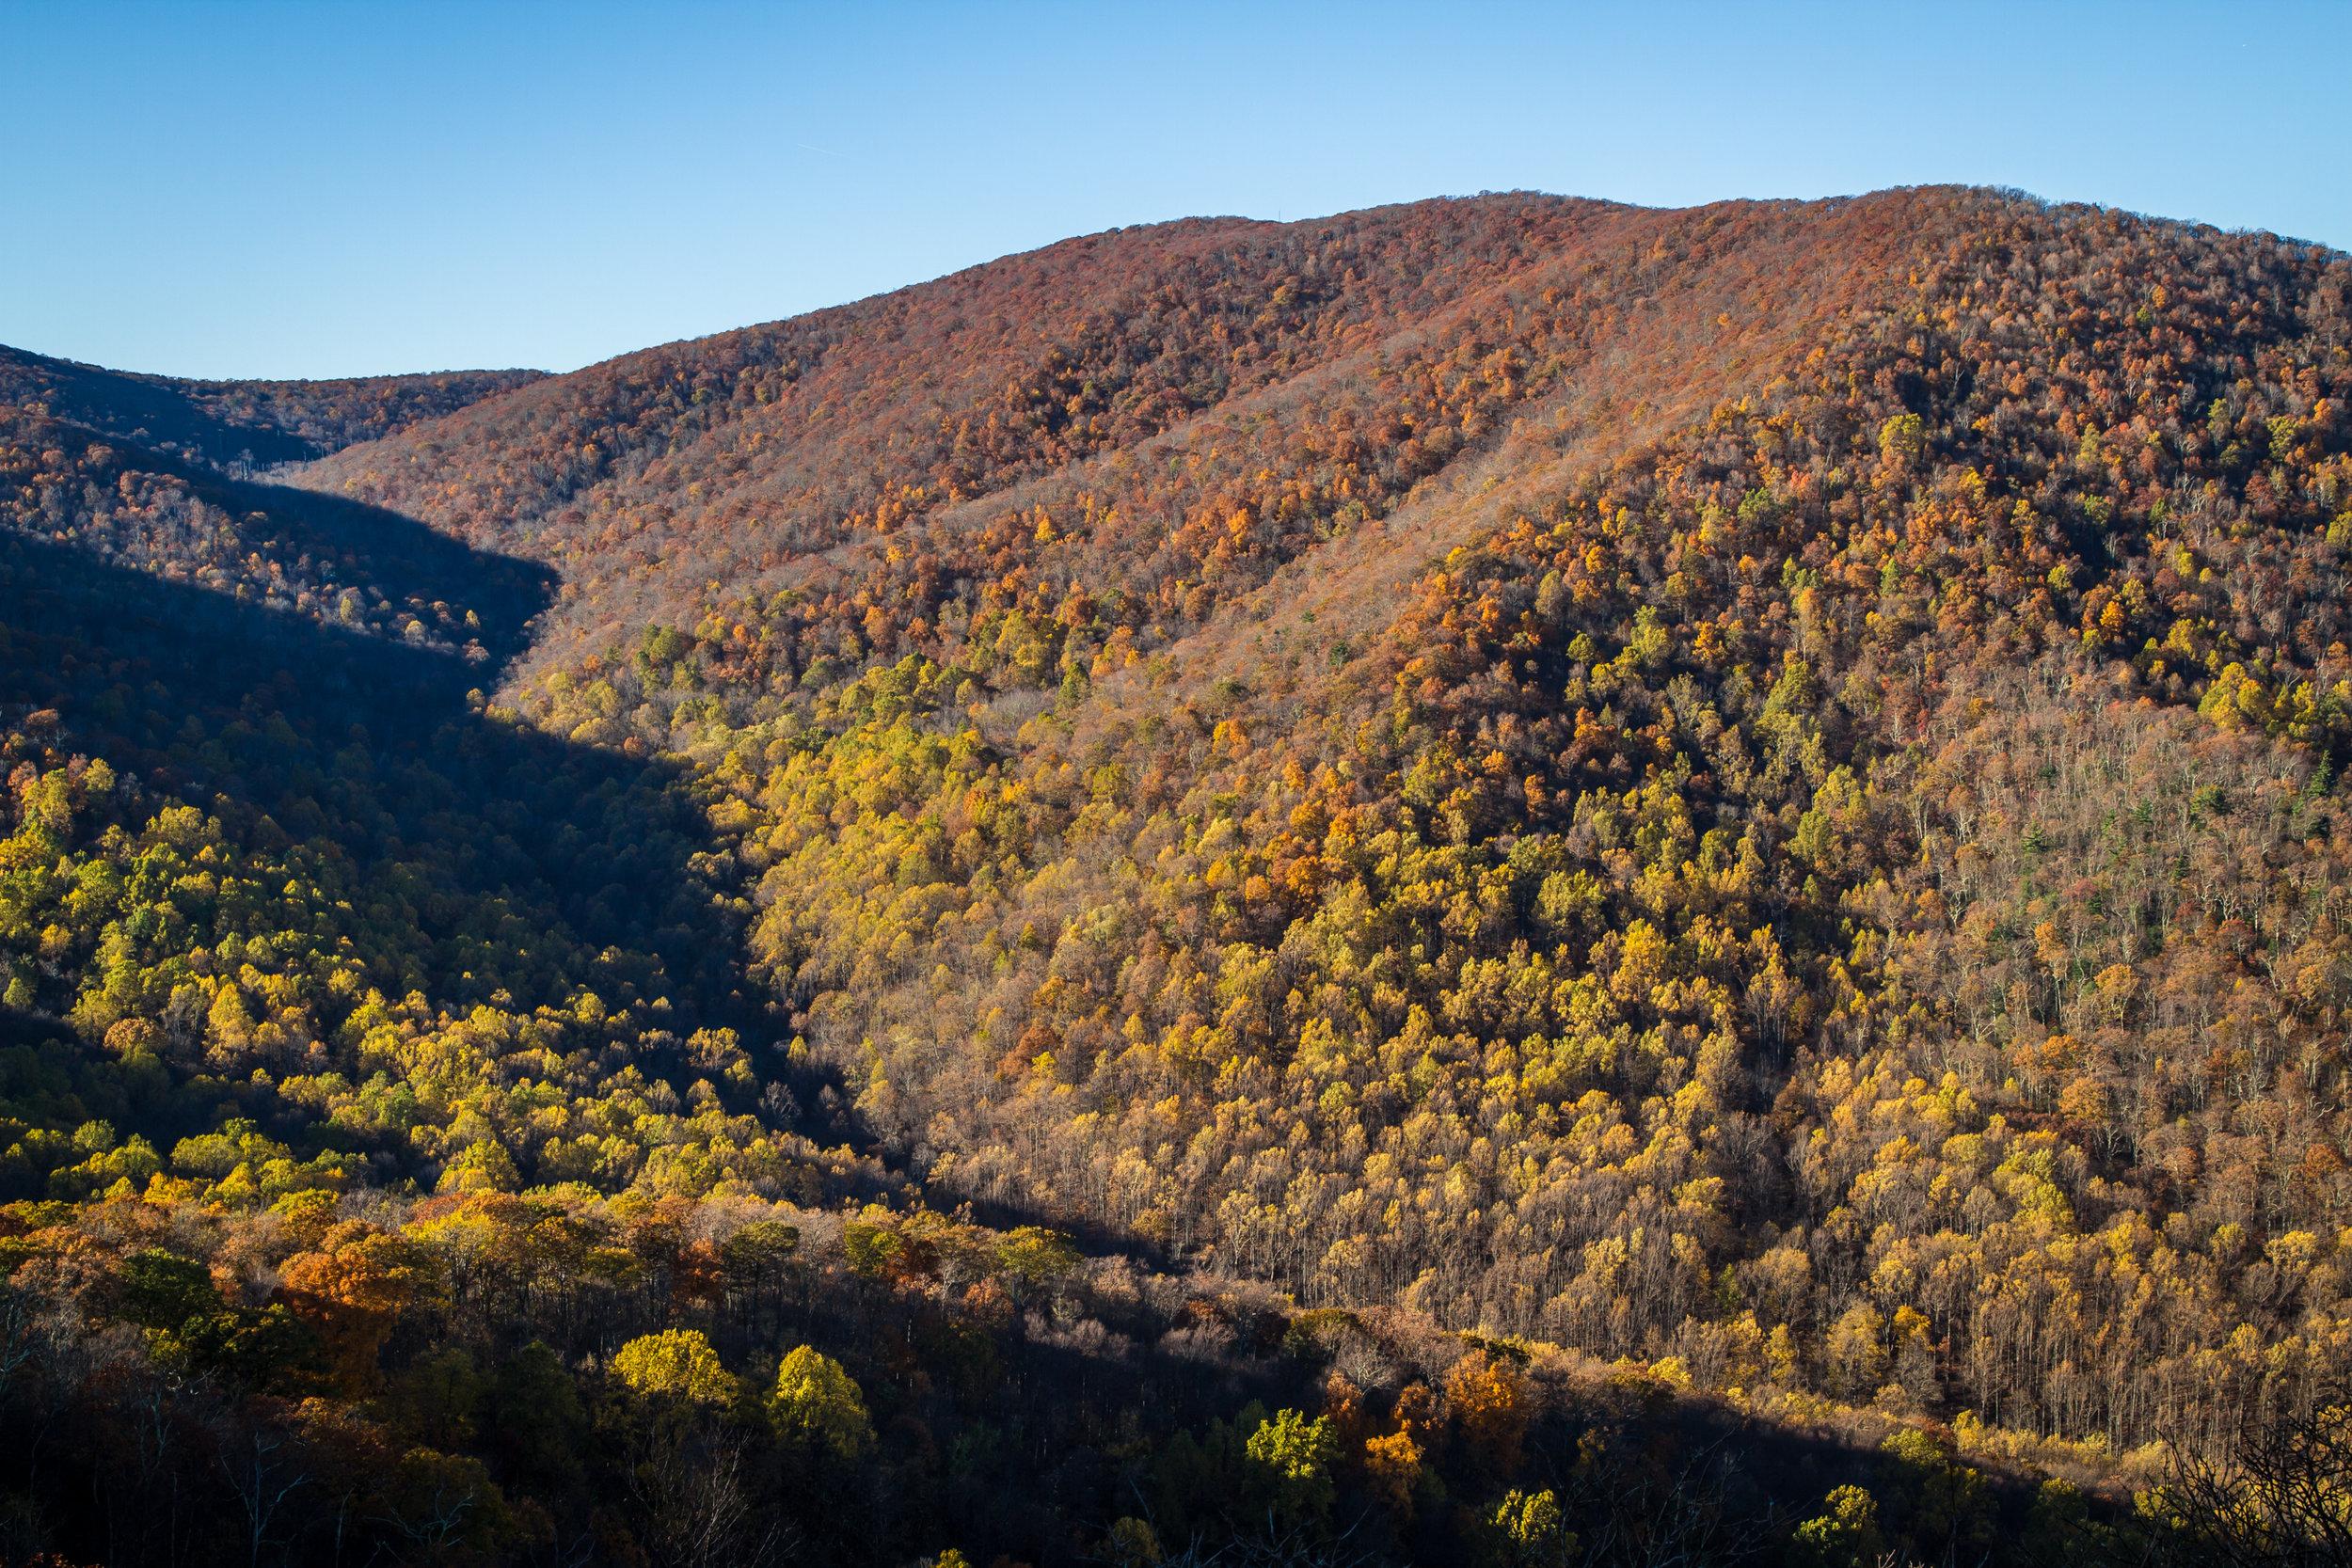 Views from Bear Church Rock, Shenandoah, Virginia